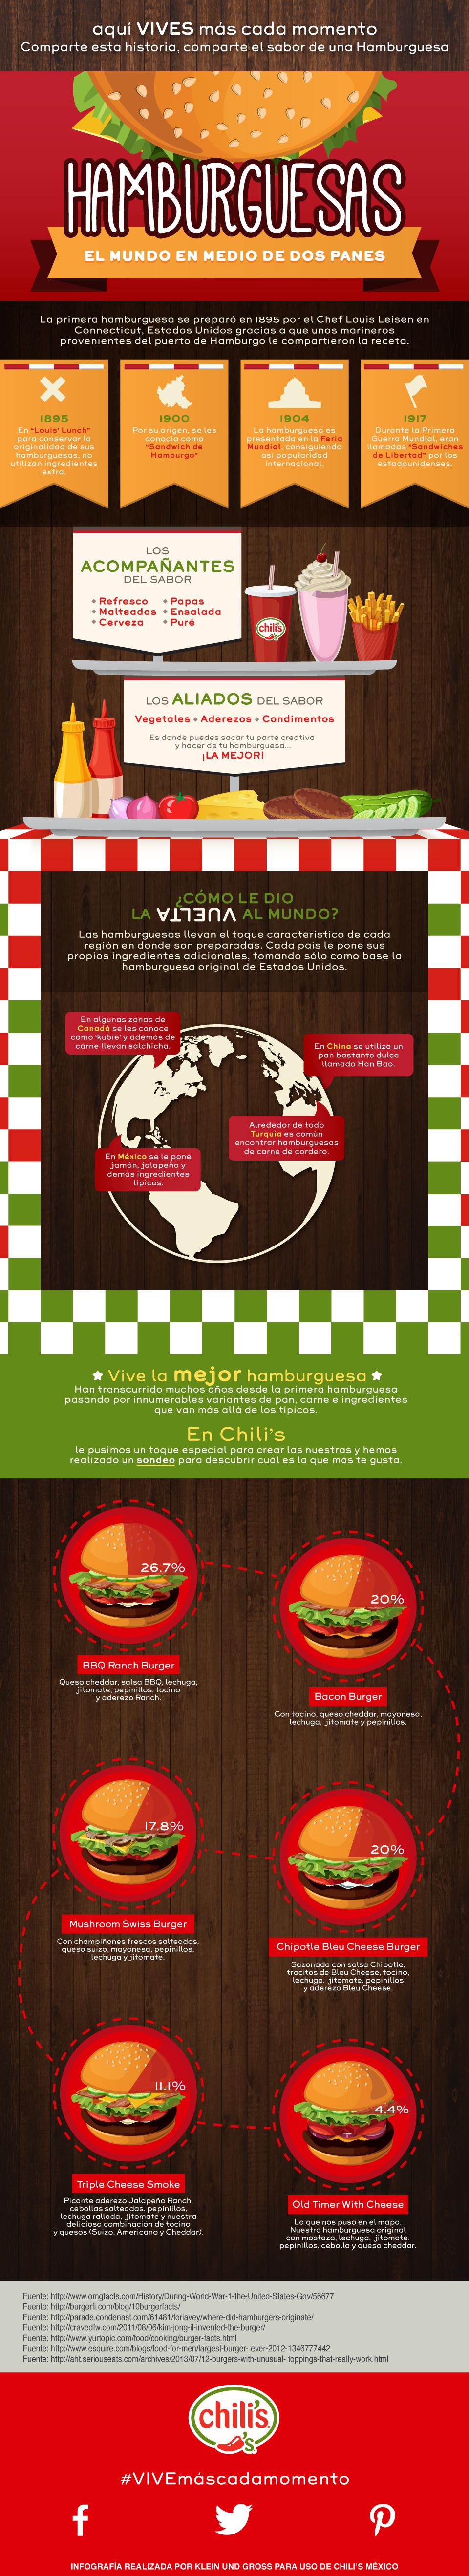 Chili's México | Infografía | Hamburguesas | Costillas al horno